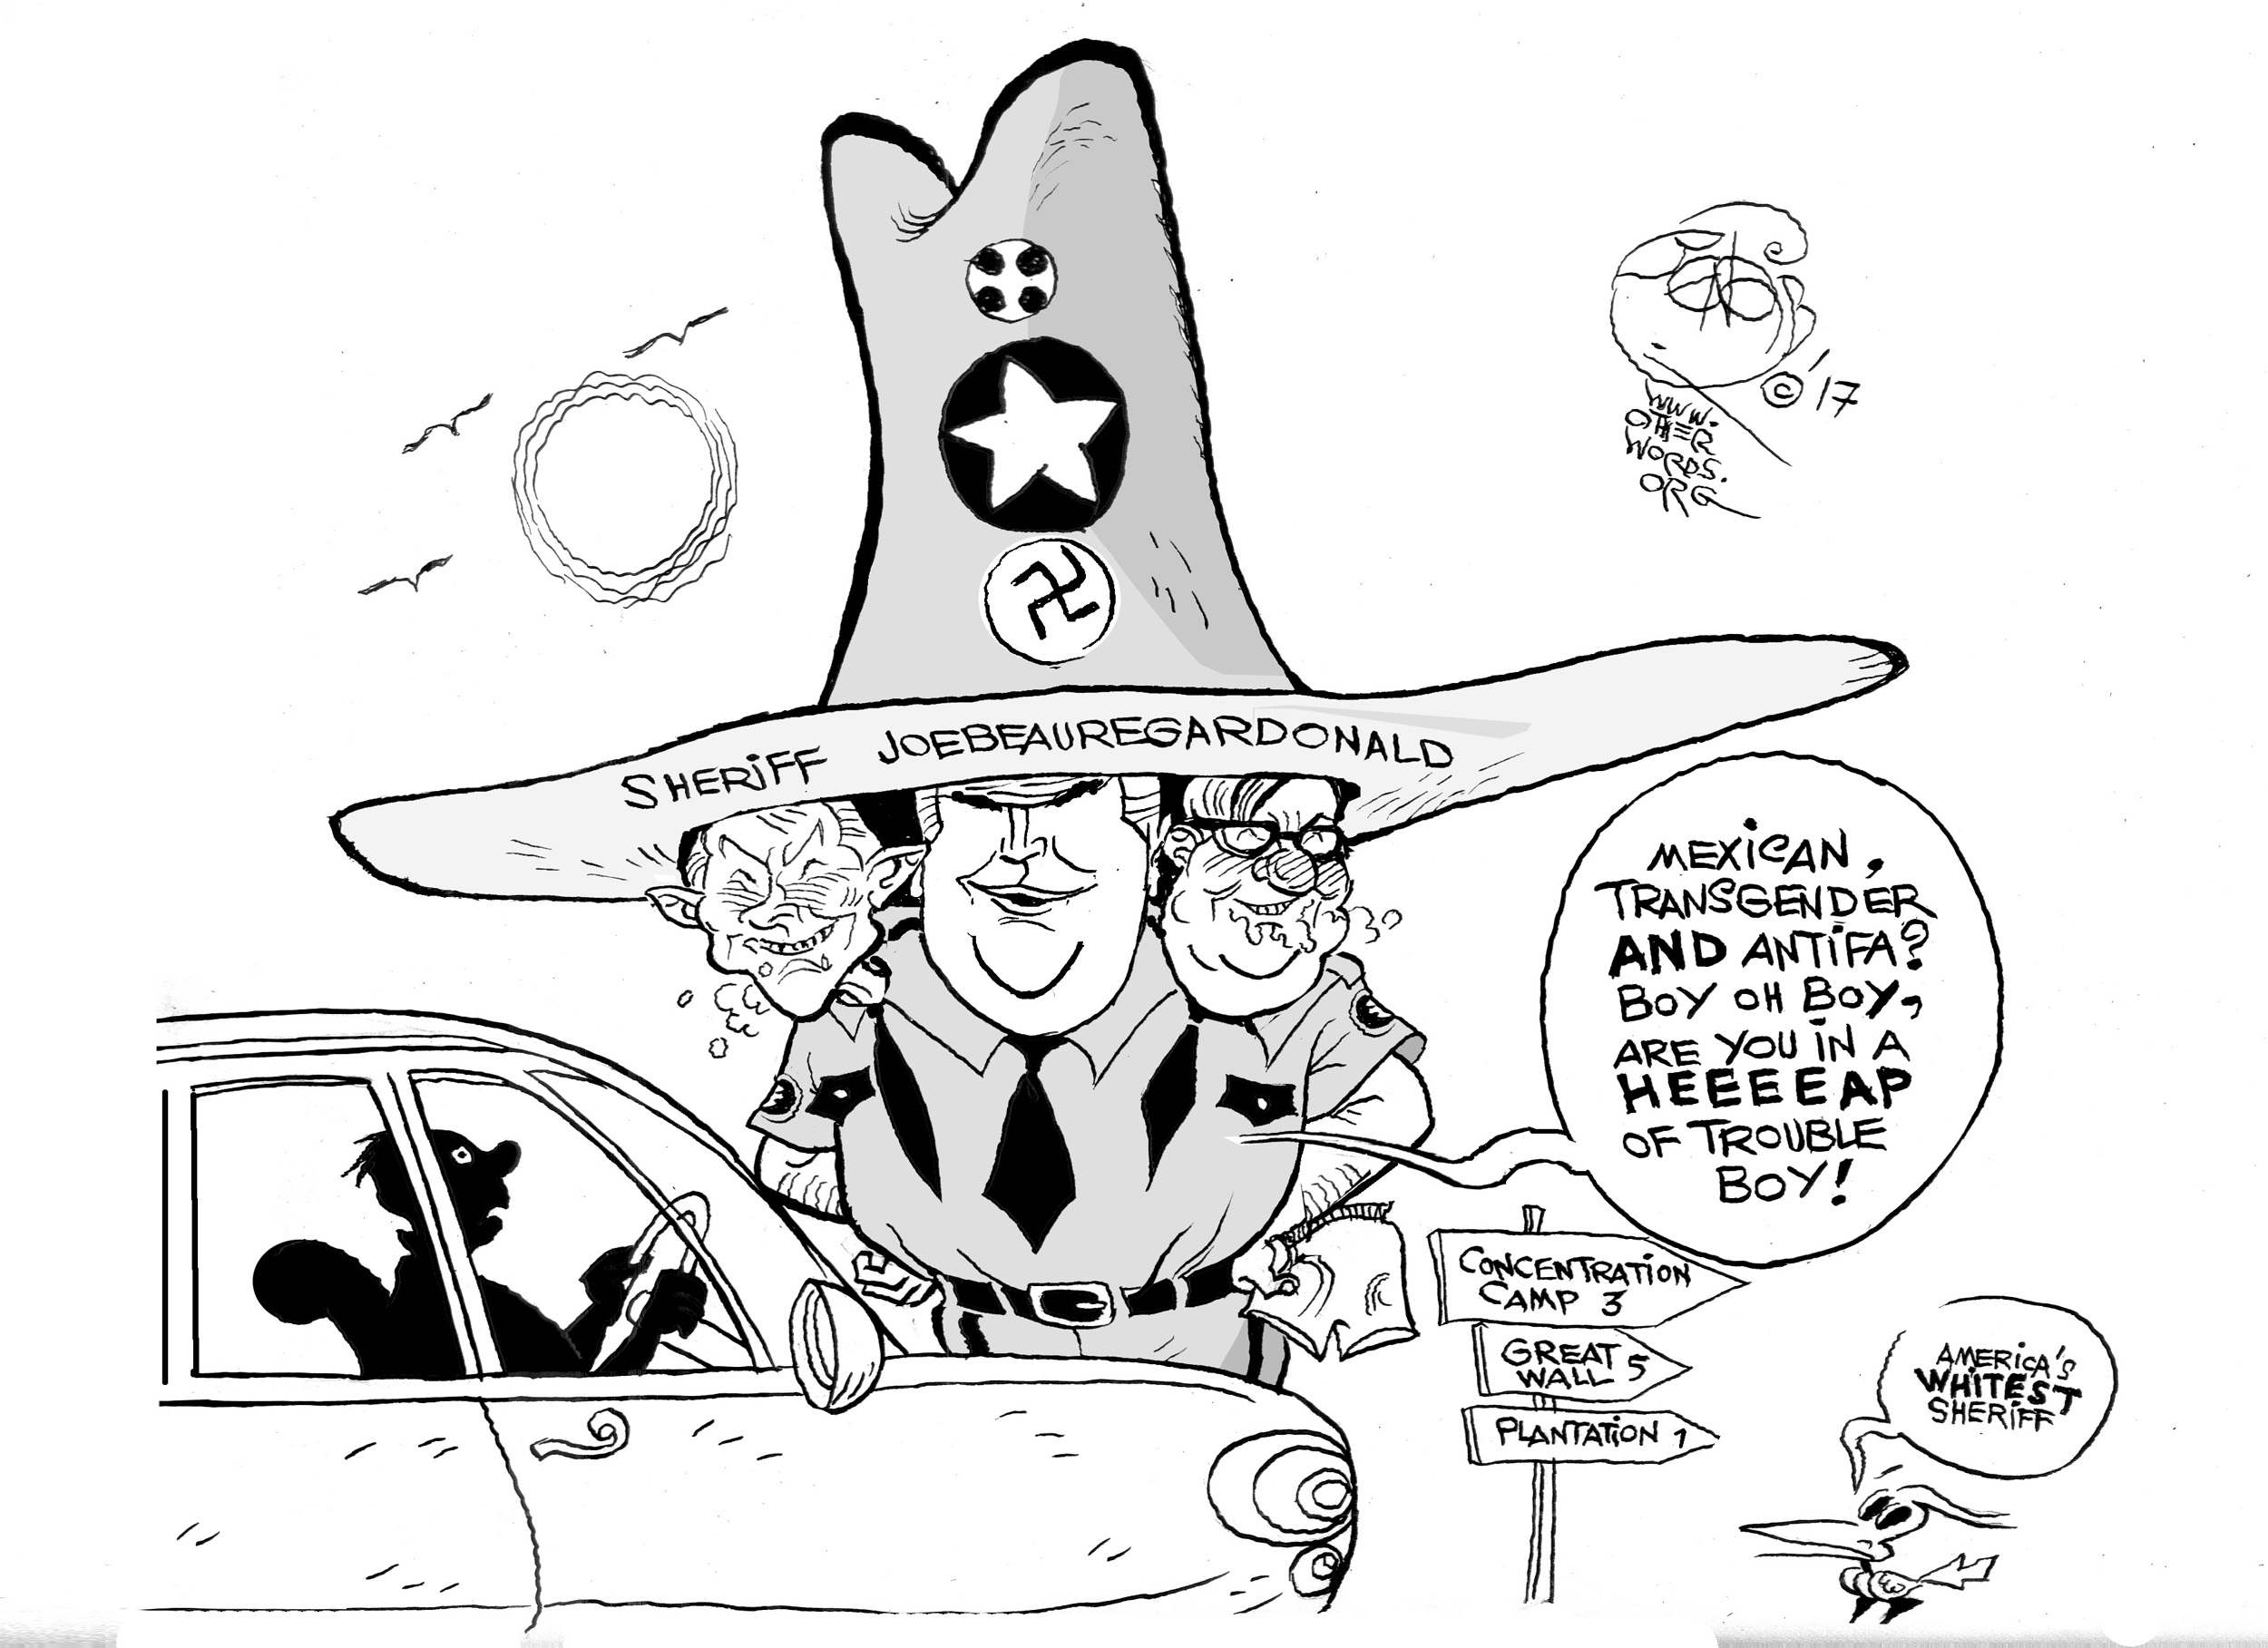 America's Whitest Sheriff